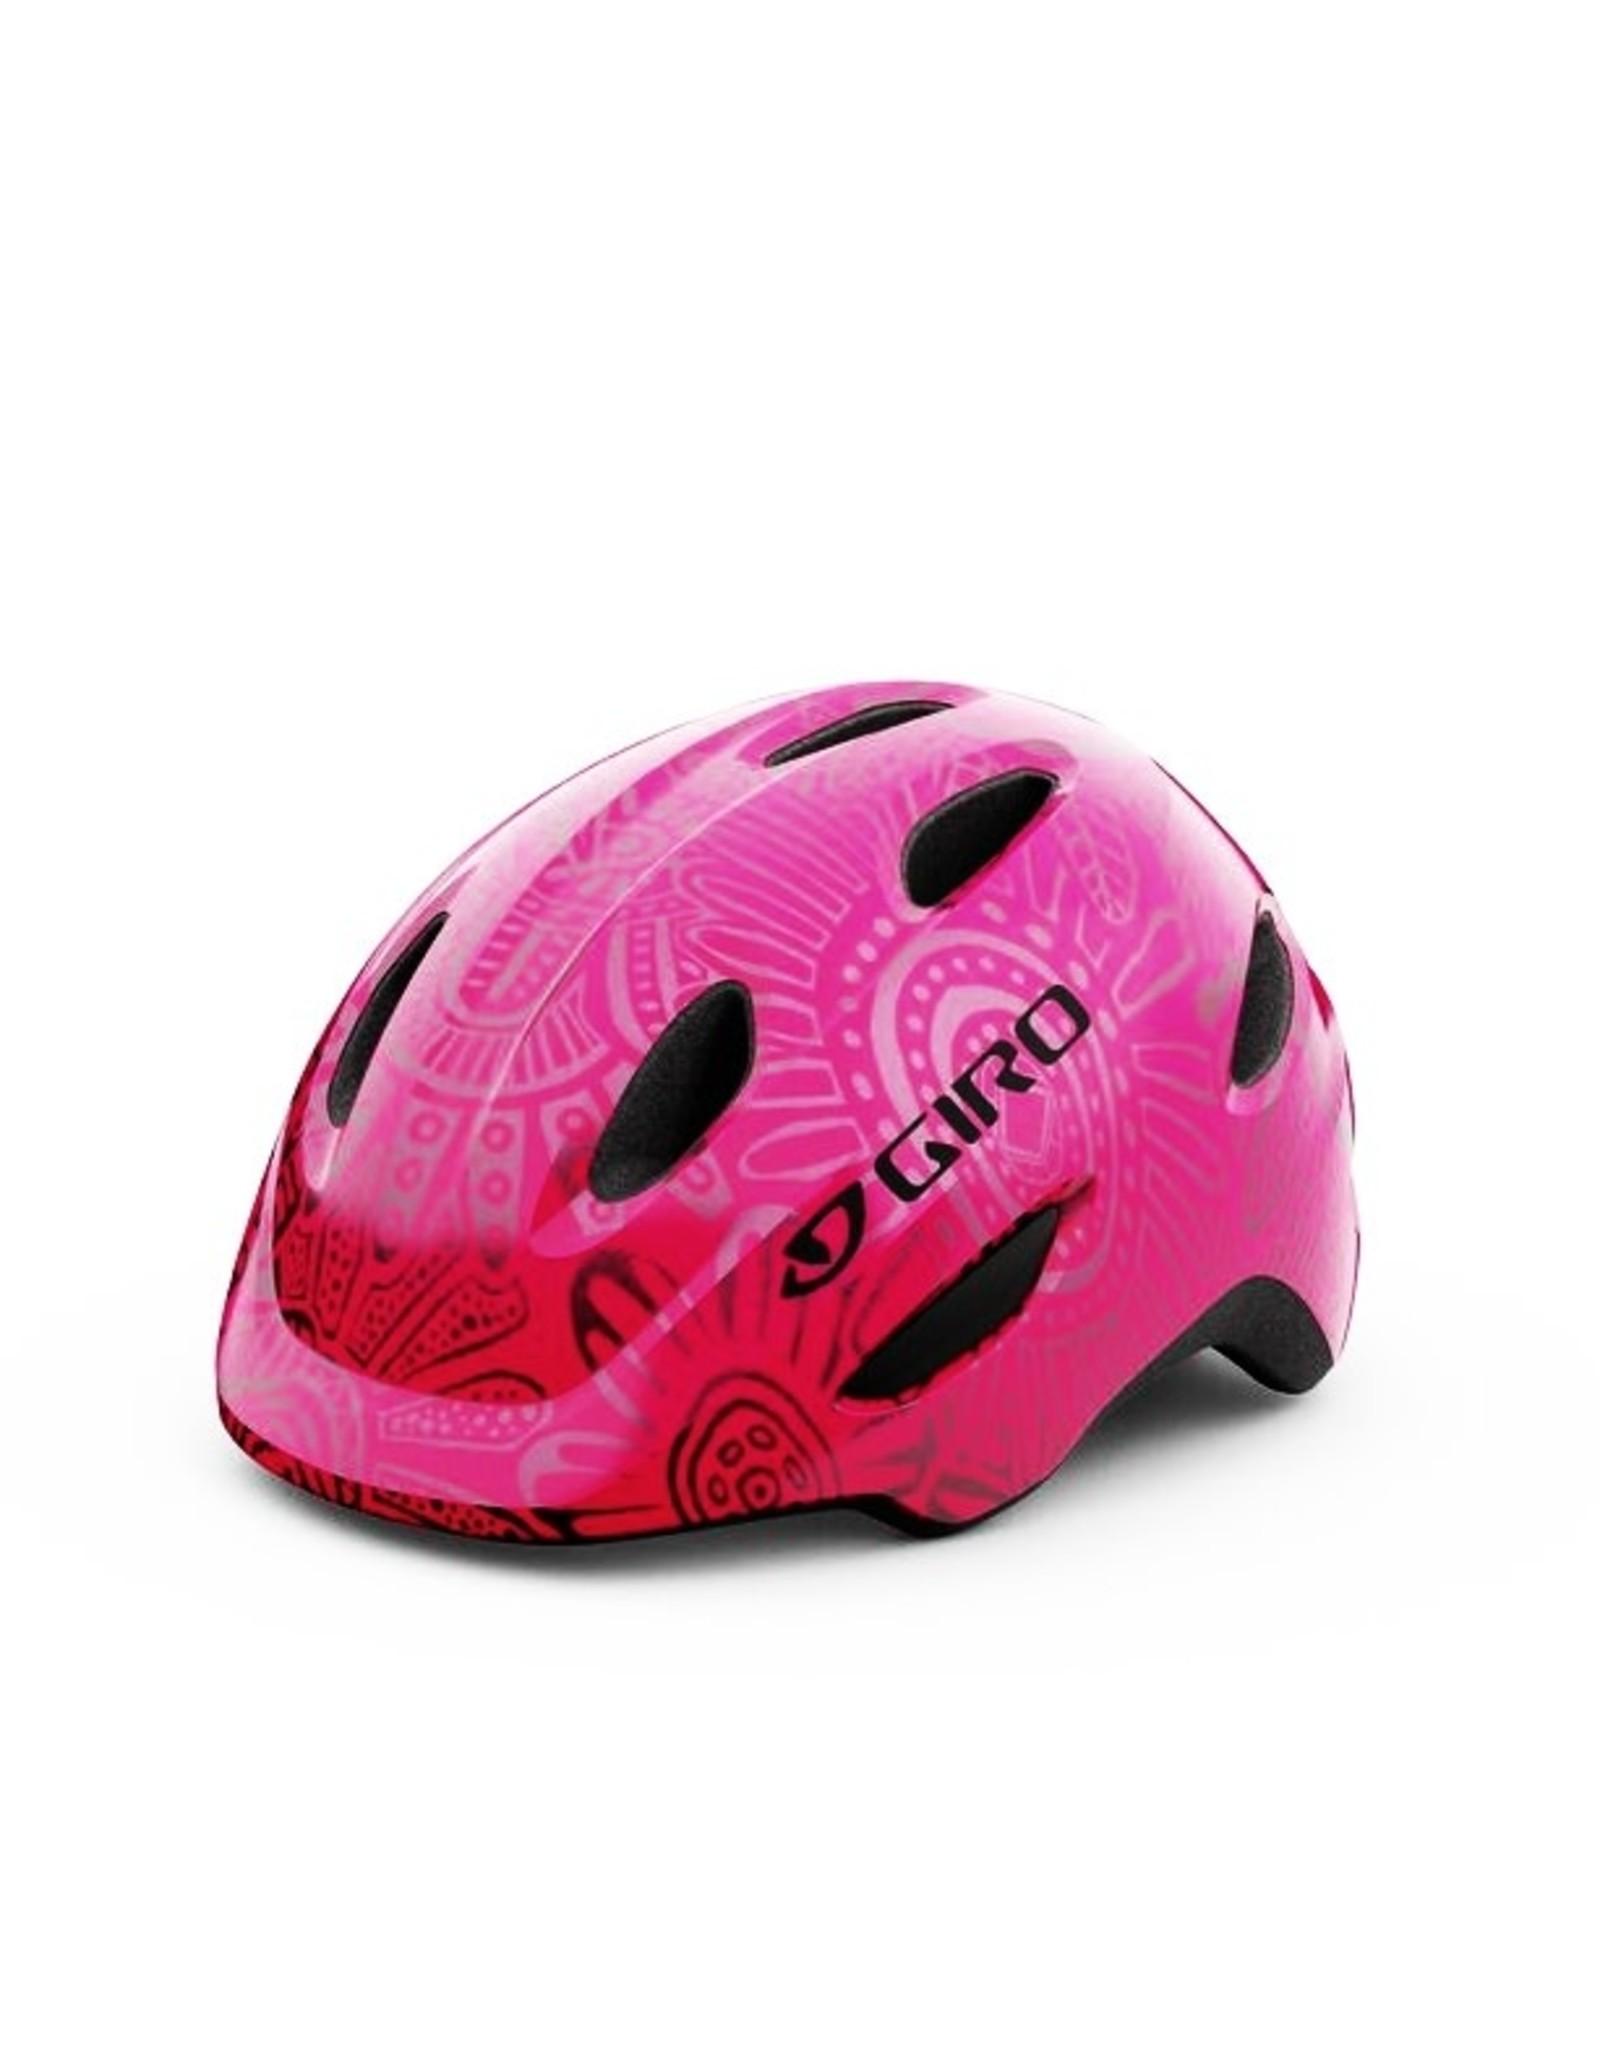 Giro GIRO SCAMP BRIGHT PINK/PEARL YOUTH BIKE HELMET